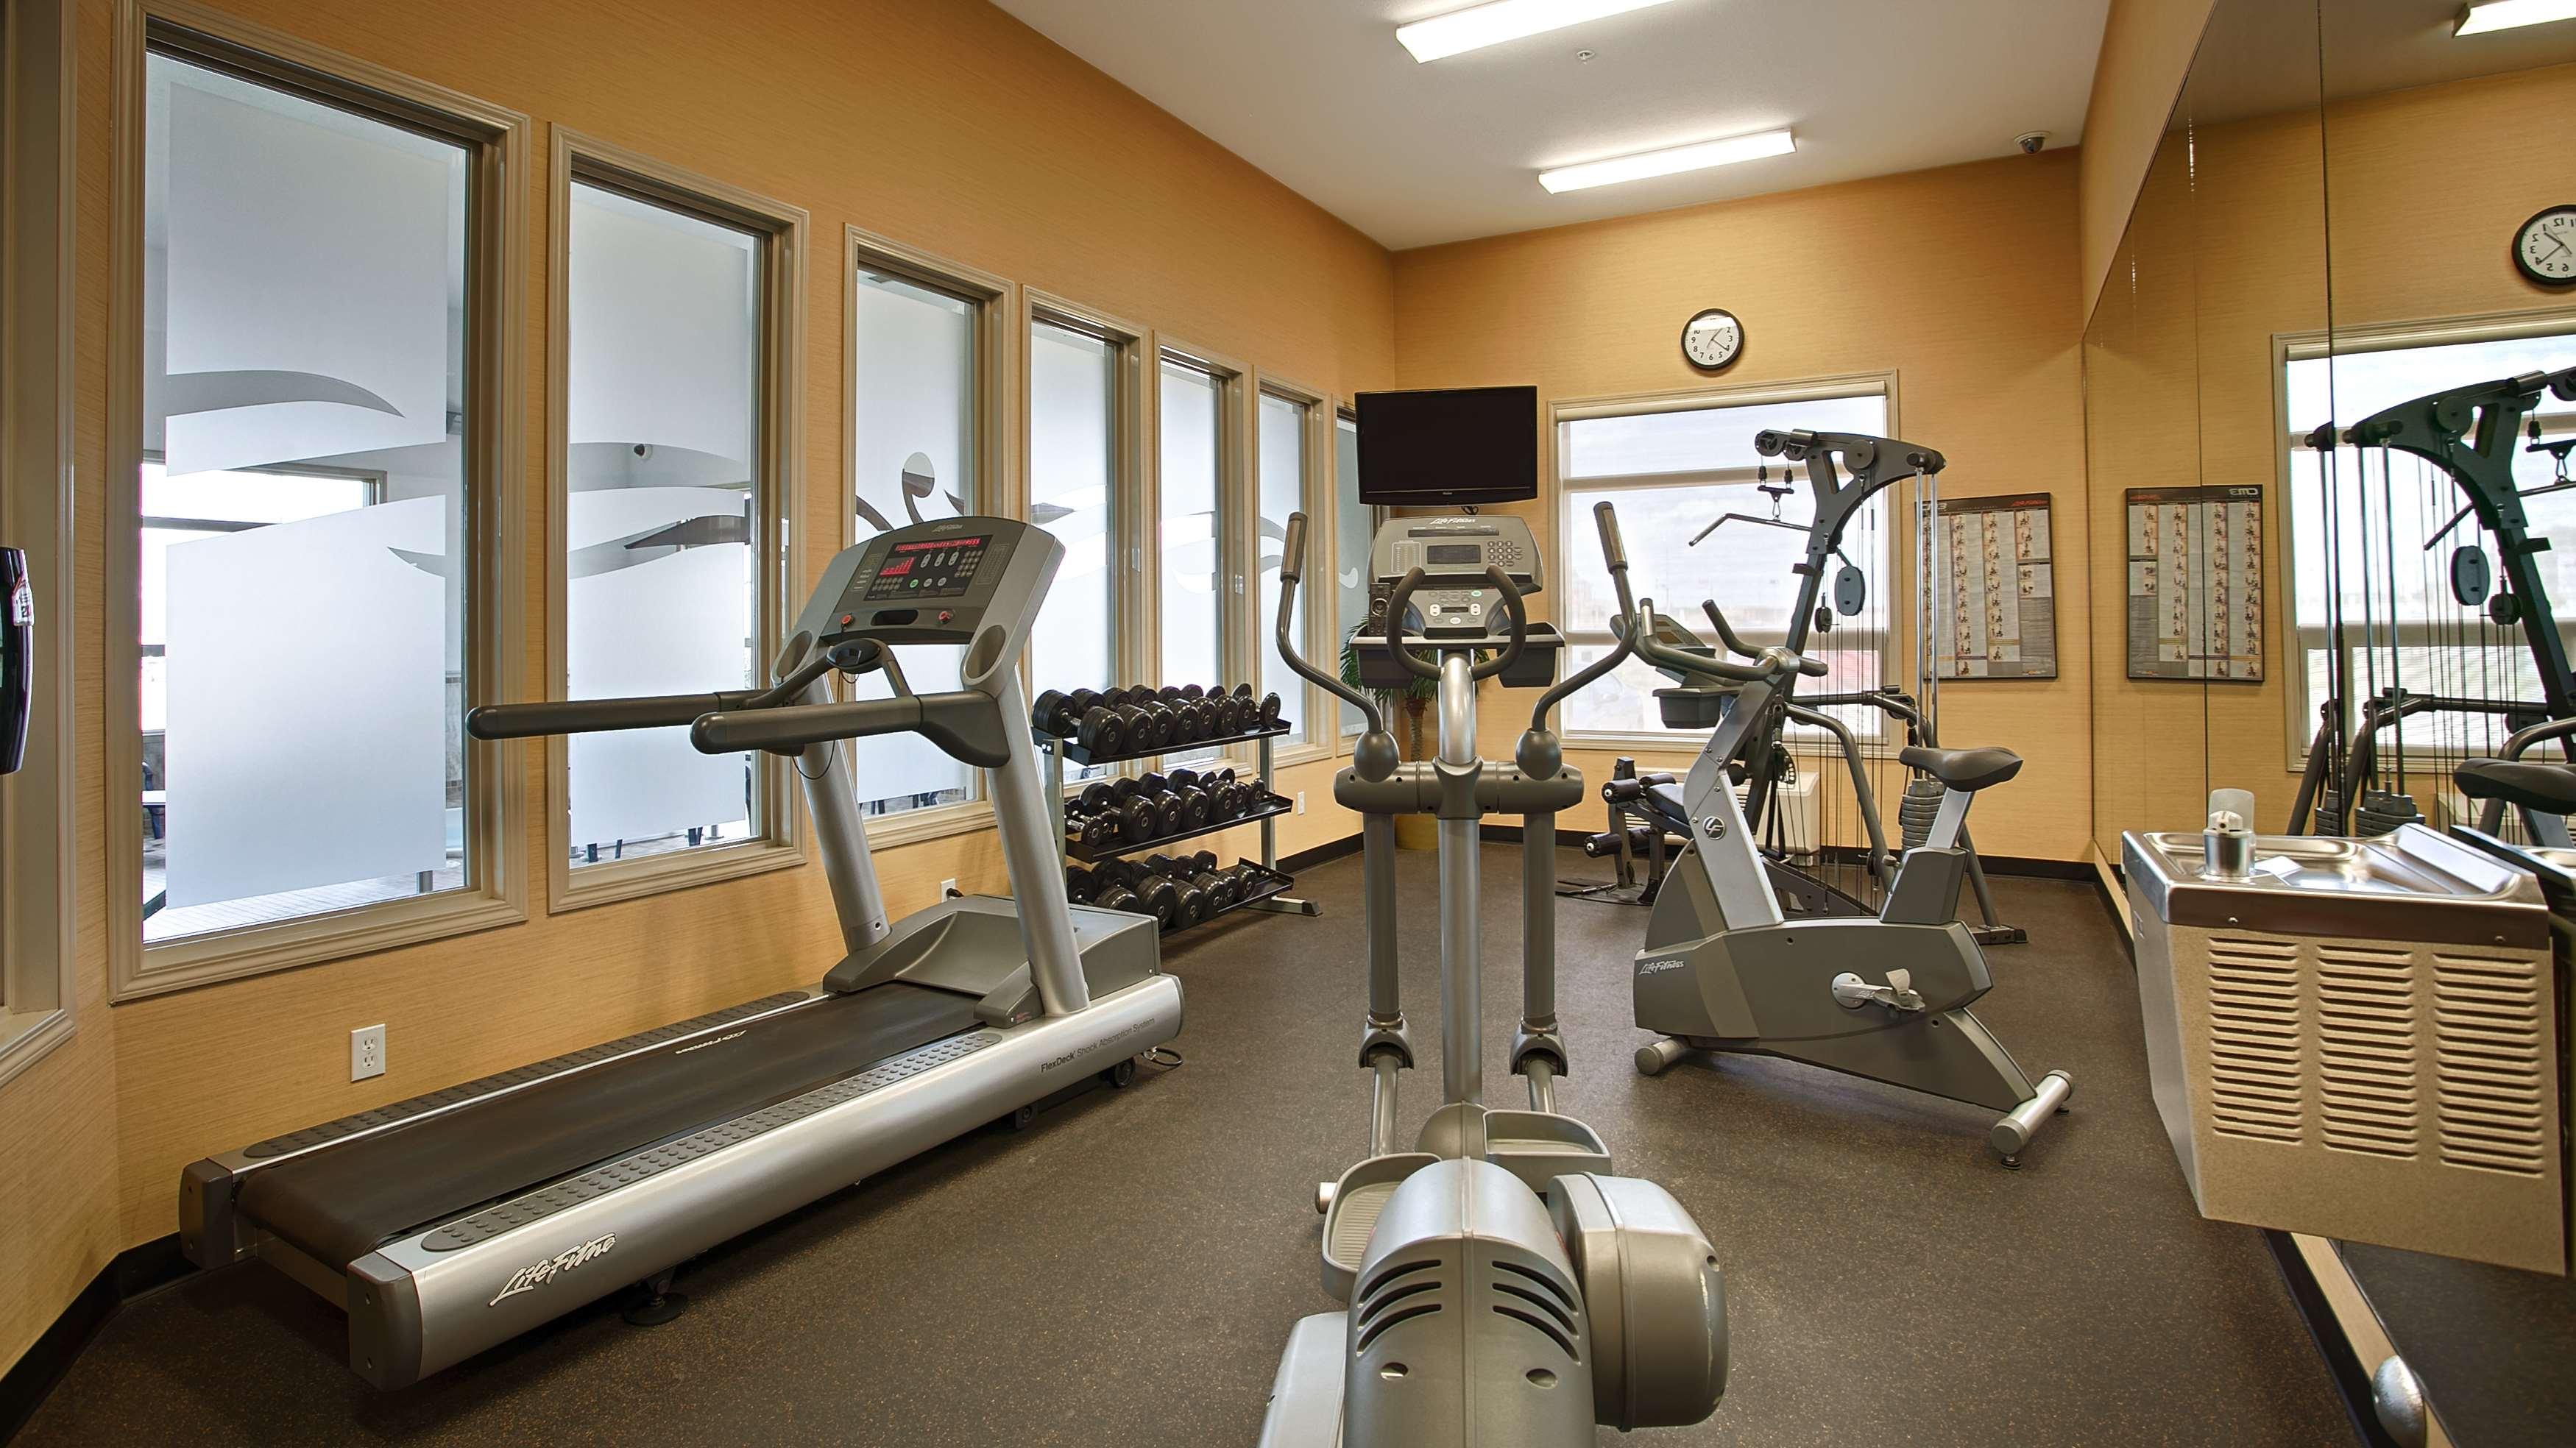 Fitness Center Best Western Wainwright Inn & Suites Wainwright (780)845-9934